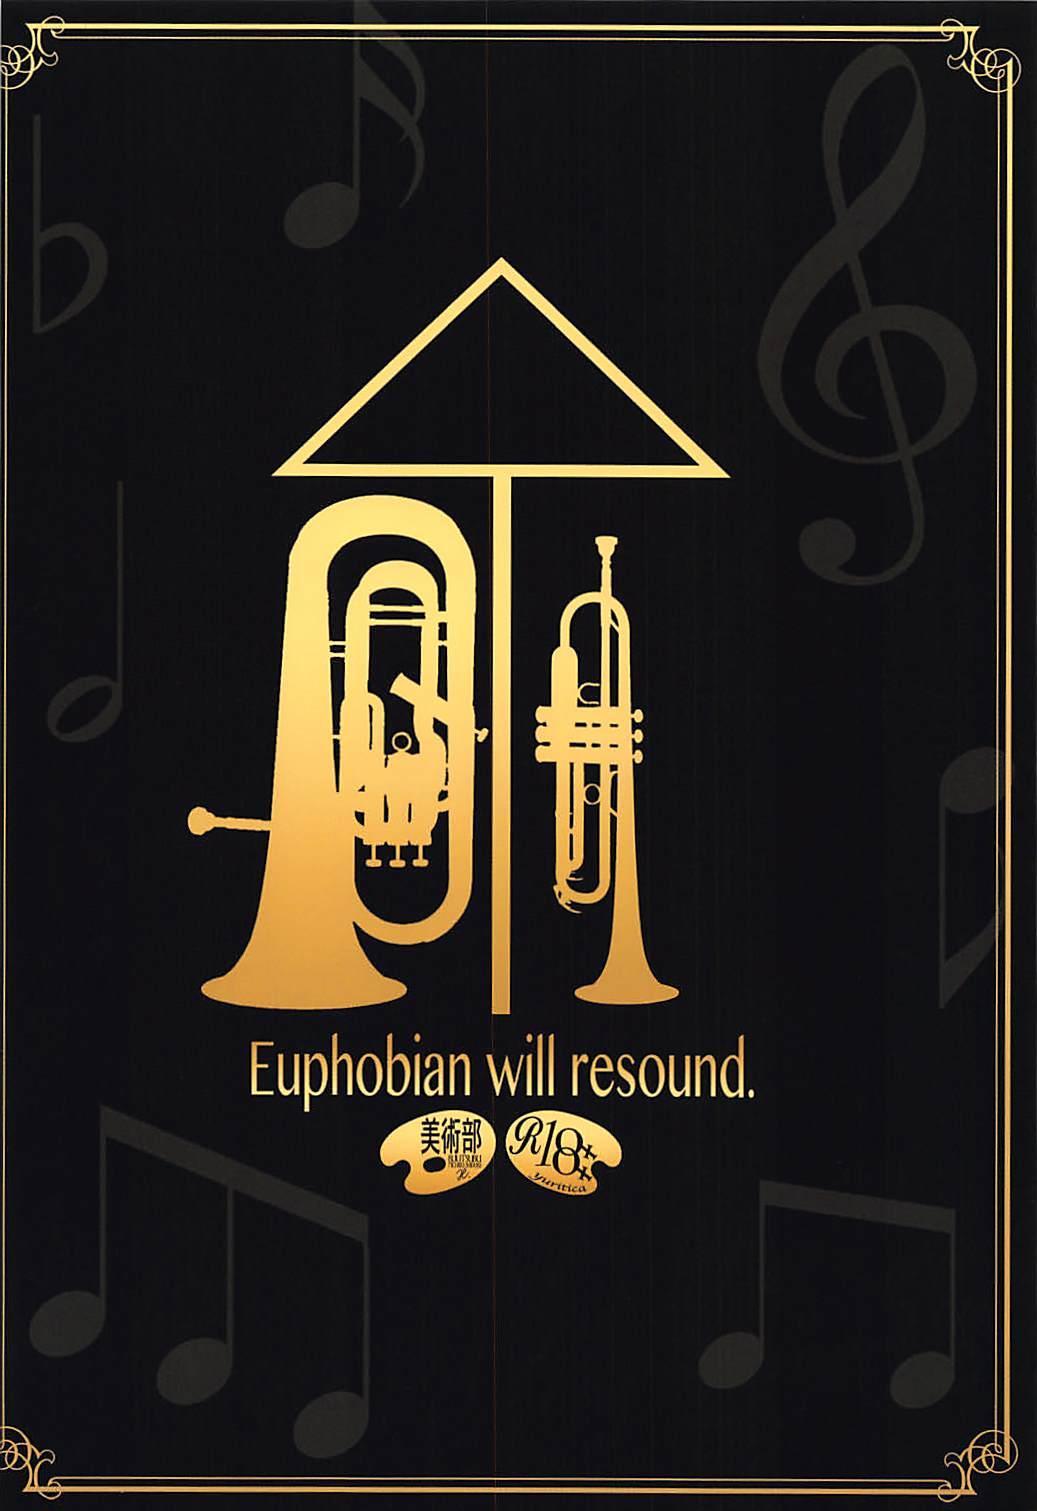 Euphobian no Hibiki Quartet - Euphobian will resound. 33